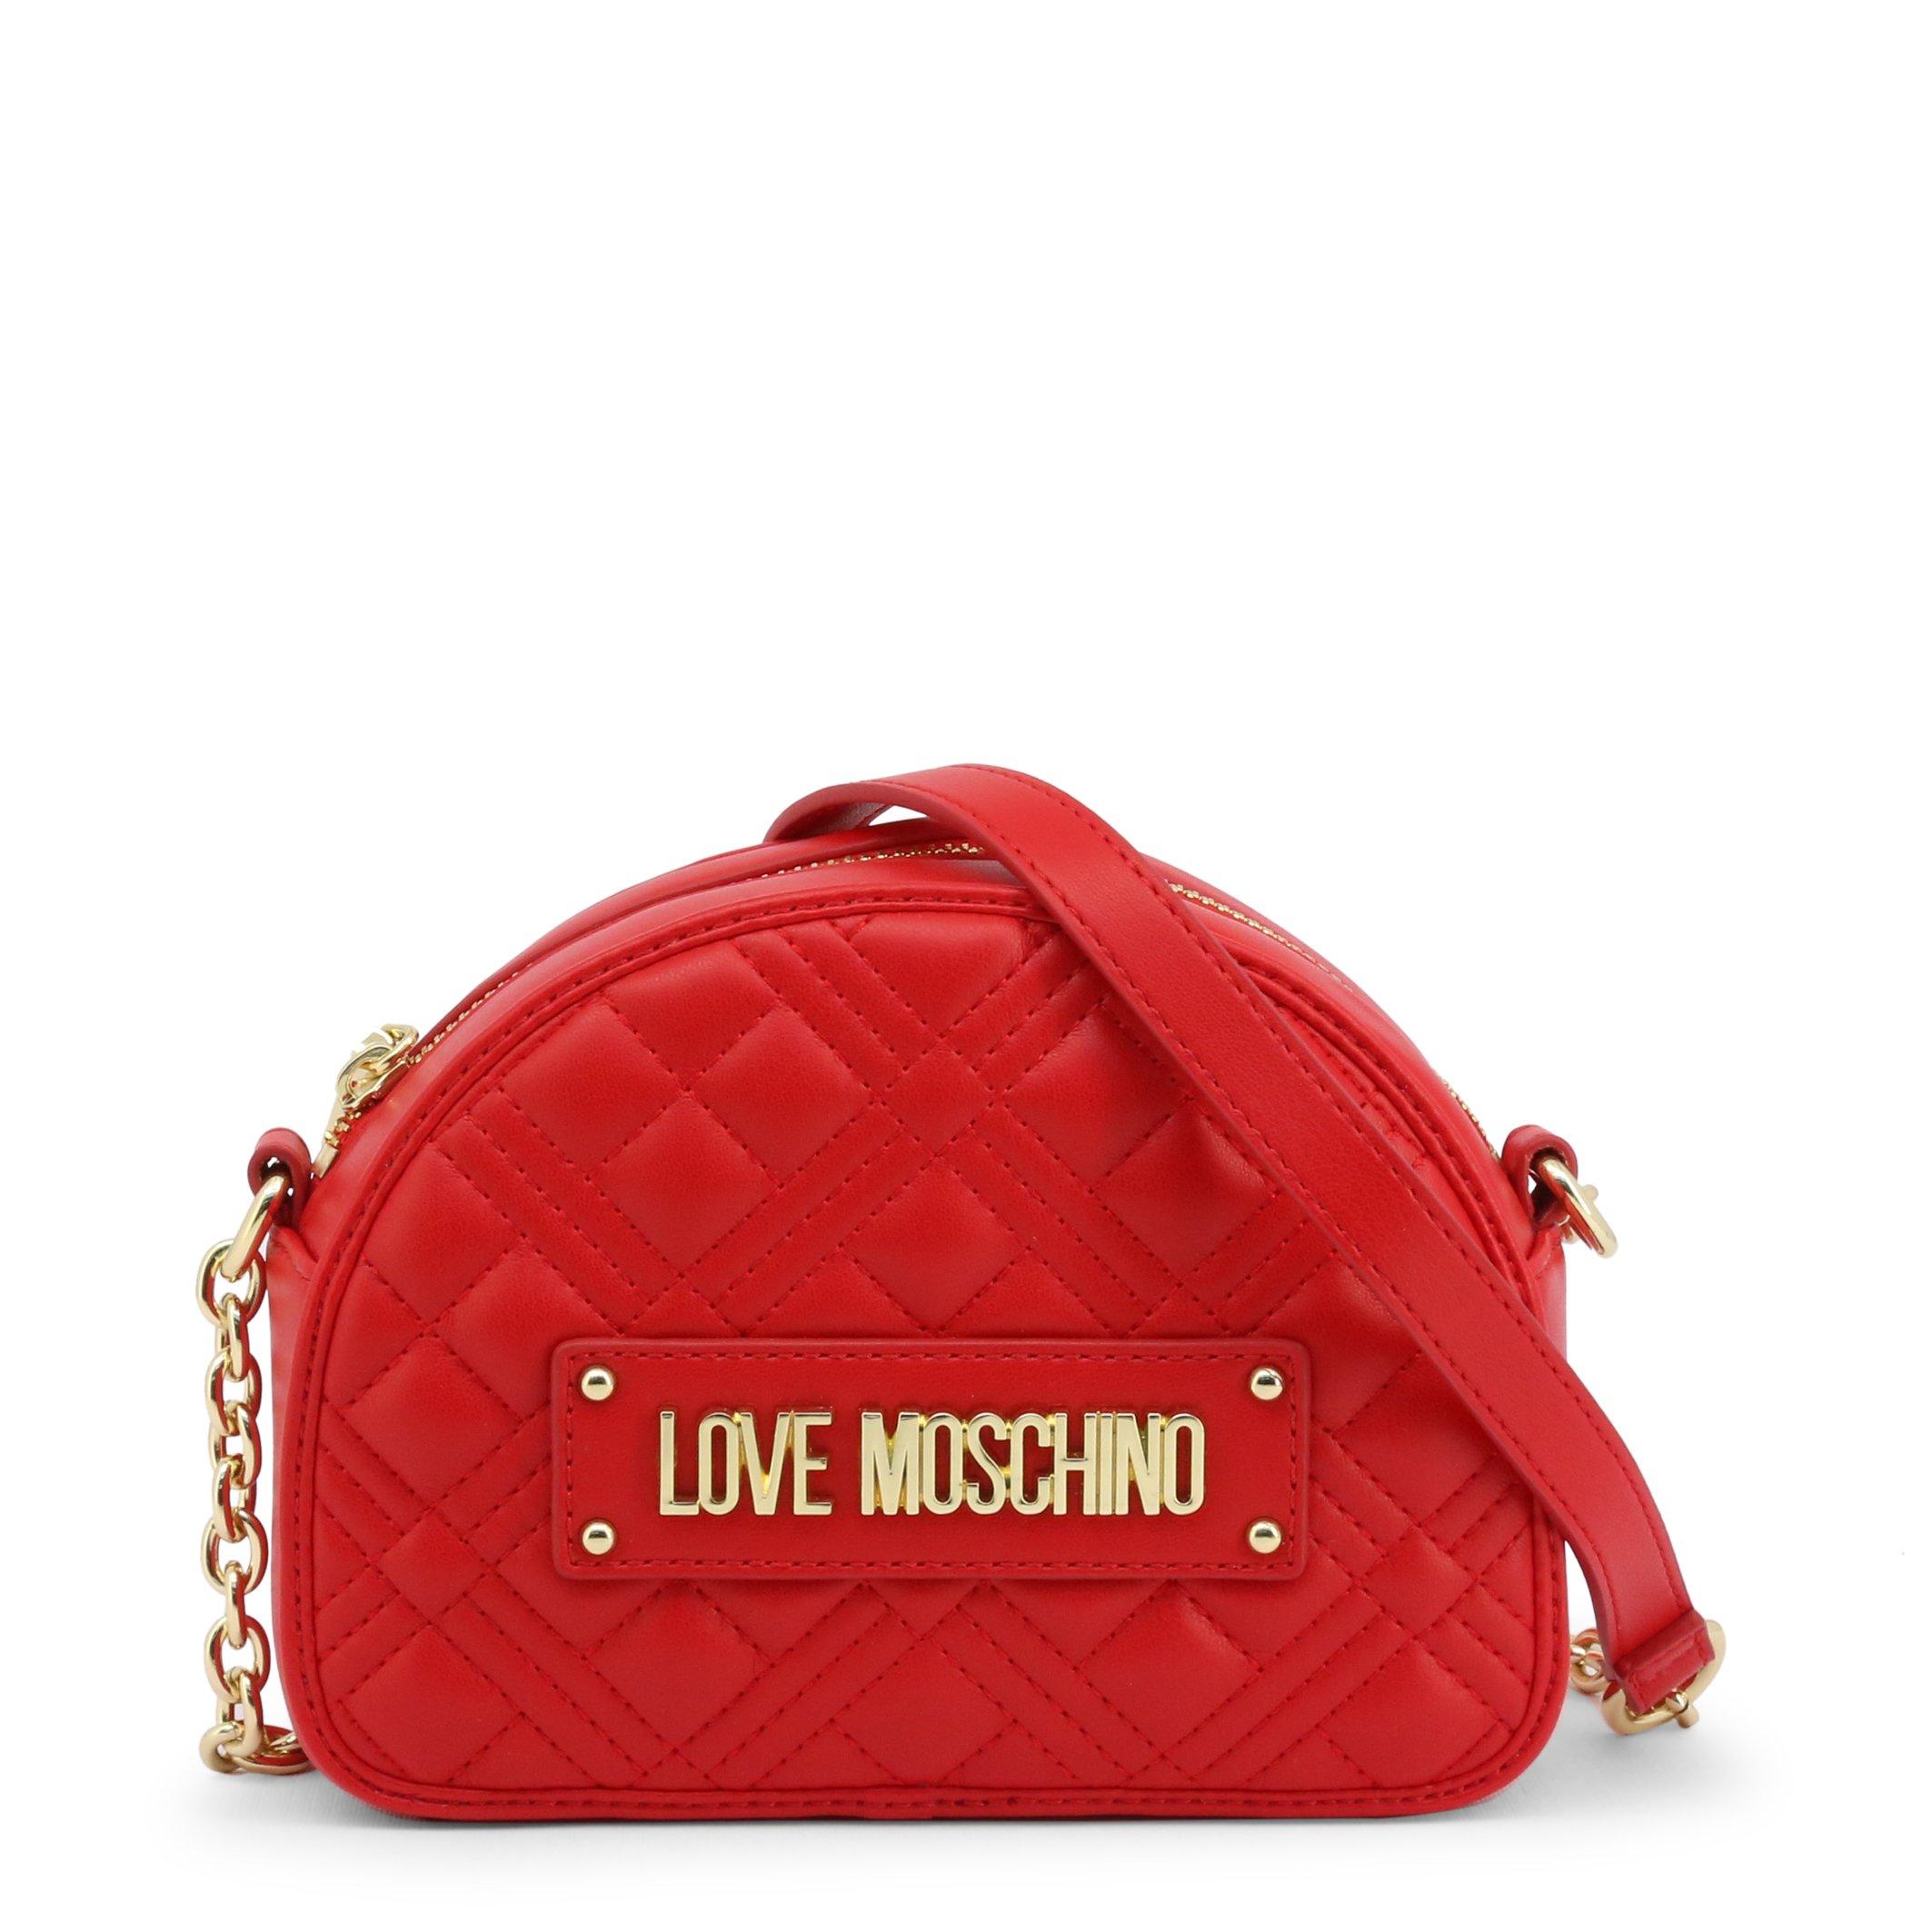 Love Moschino Women's Crossbody Bag Black JC4004PP1CLA0 - red NOSIZE